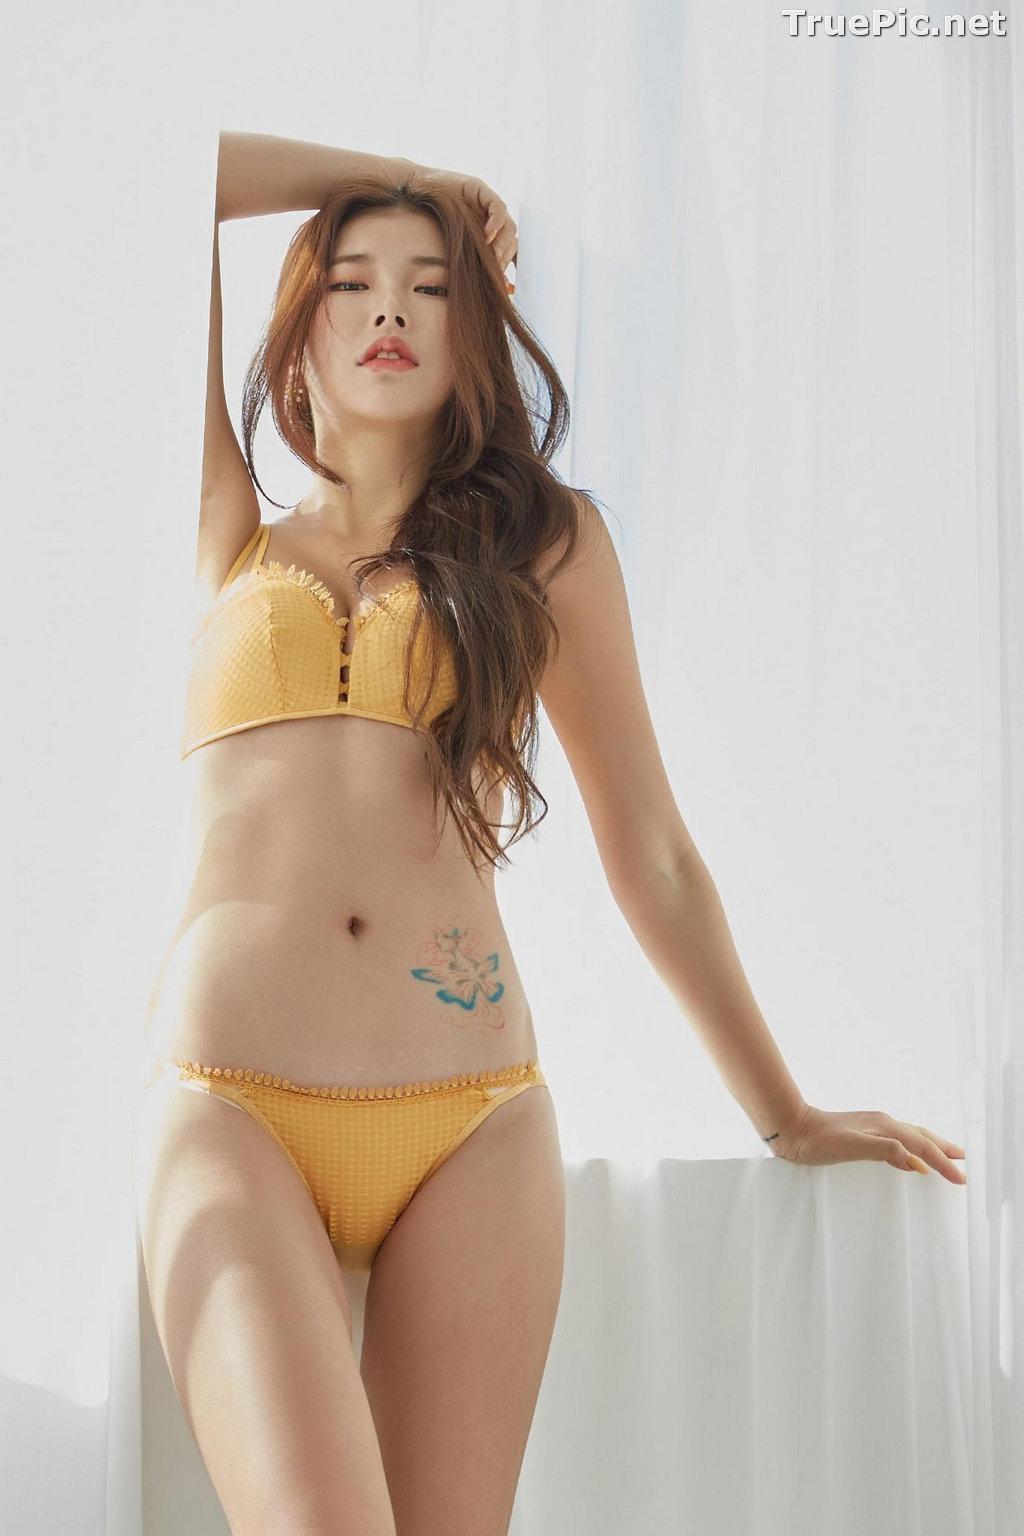 Image Korean Fashion Model – Da Yomi (다요미) – Lountess Spring Lingerie #3 - TruePic.net - Picture-9